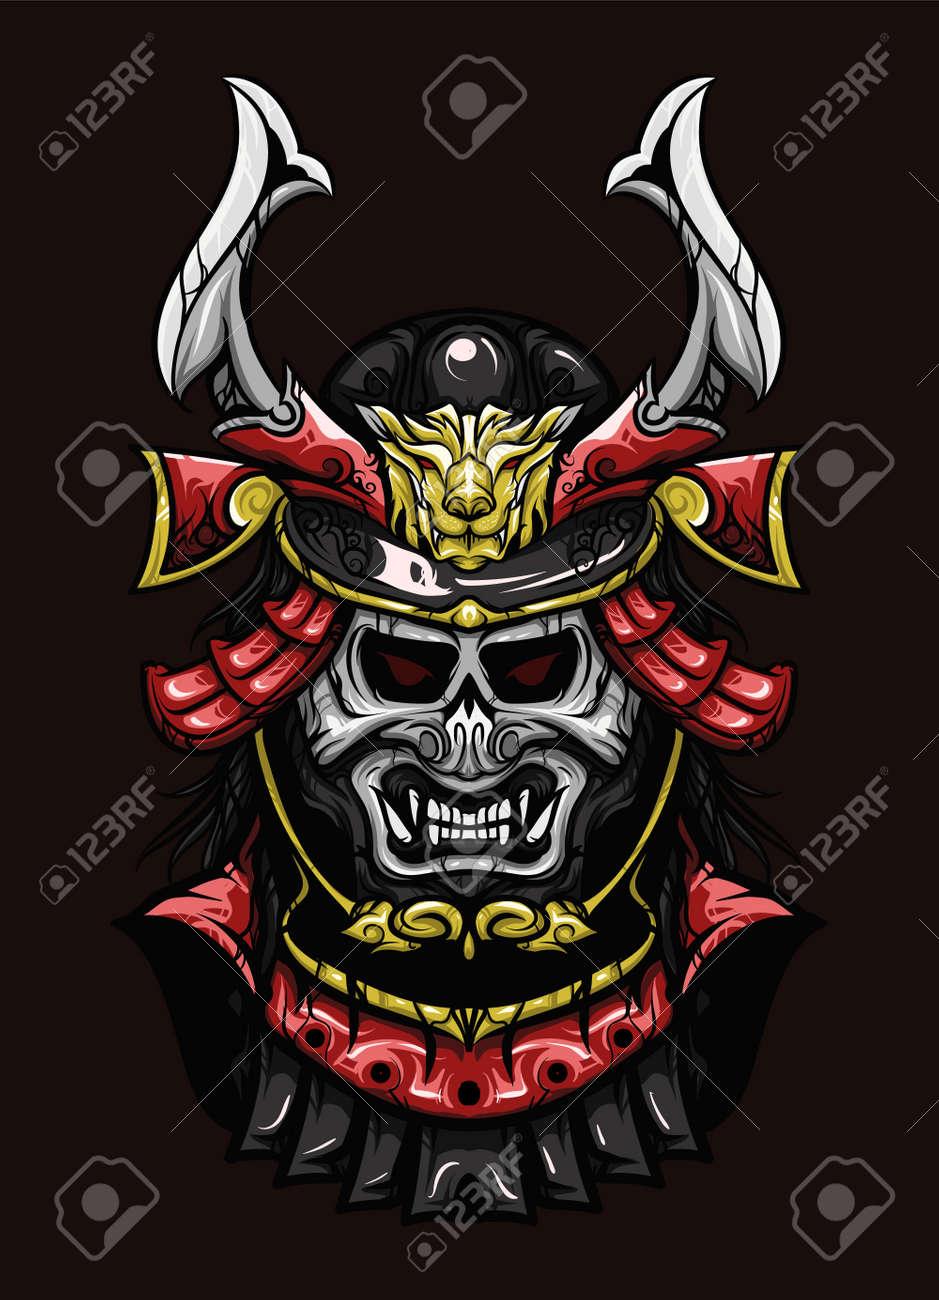 Oni Samurai Head Vector Illustration Royalty Free Cliparts Vectors And Stock Illustration Image 148629586